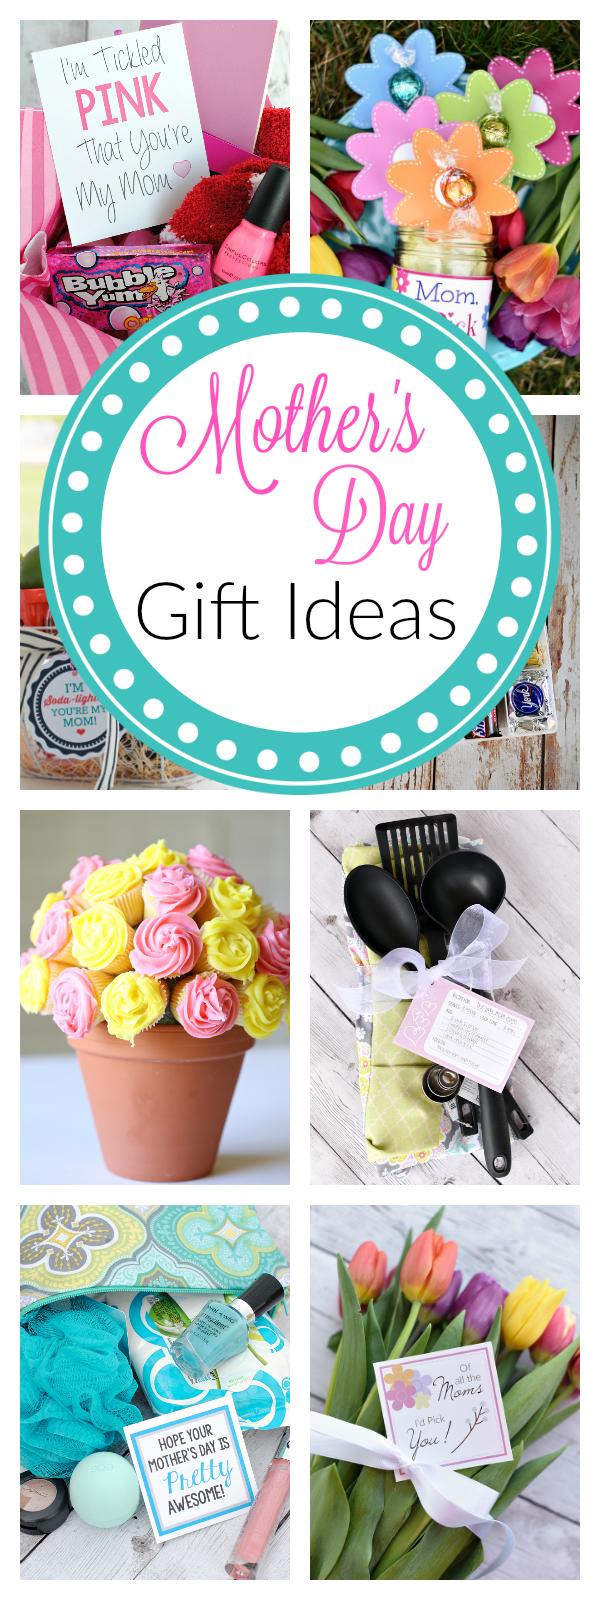 25 Fun Mother's Day Gift Ideas – Fun-Squared